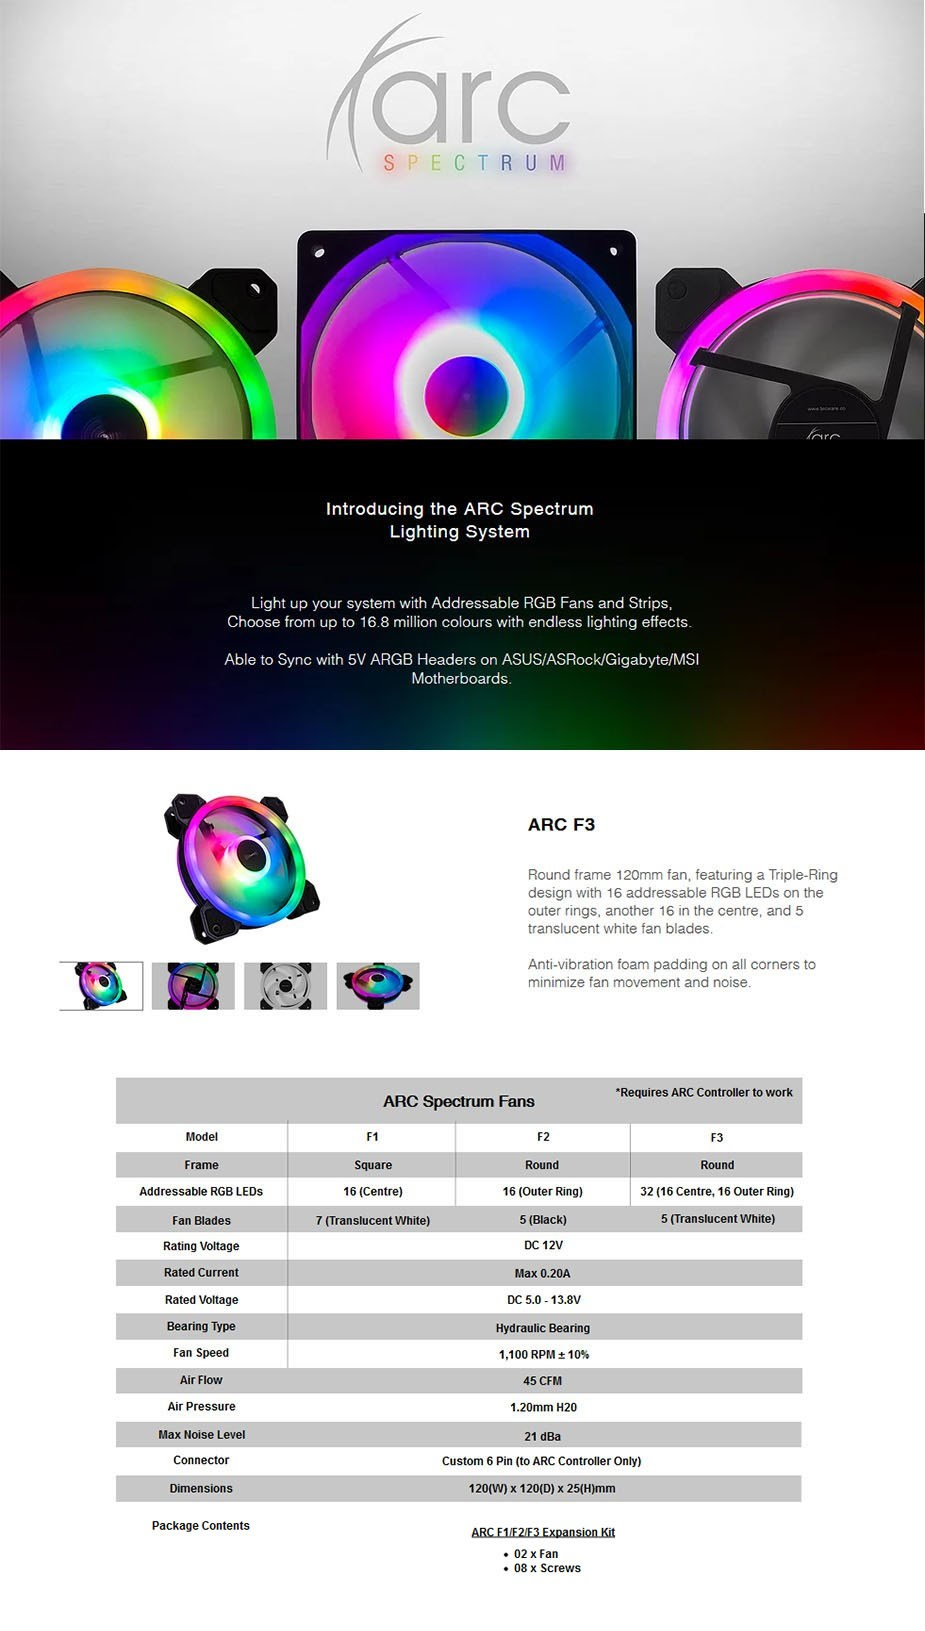 Tecware ARC Spectrum F3 120mm RGB LED Fan Expansion Kit - Overview 1